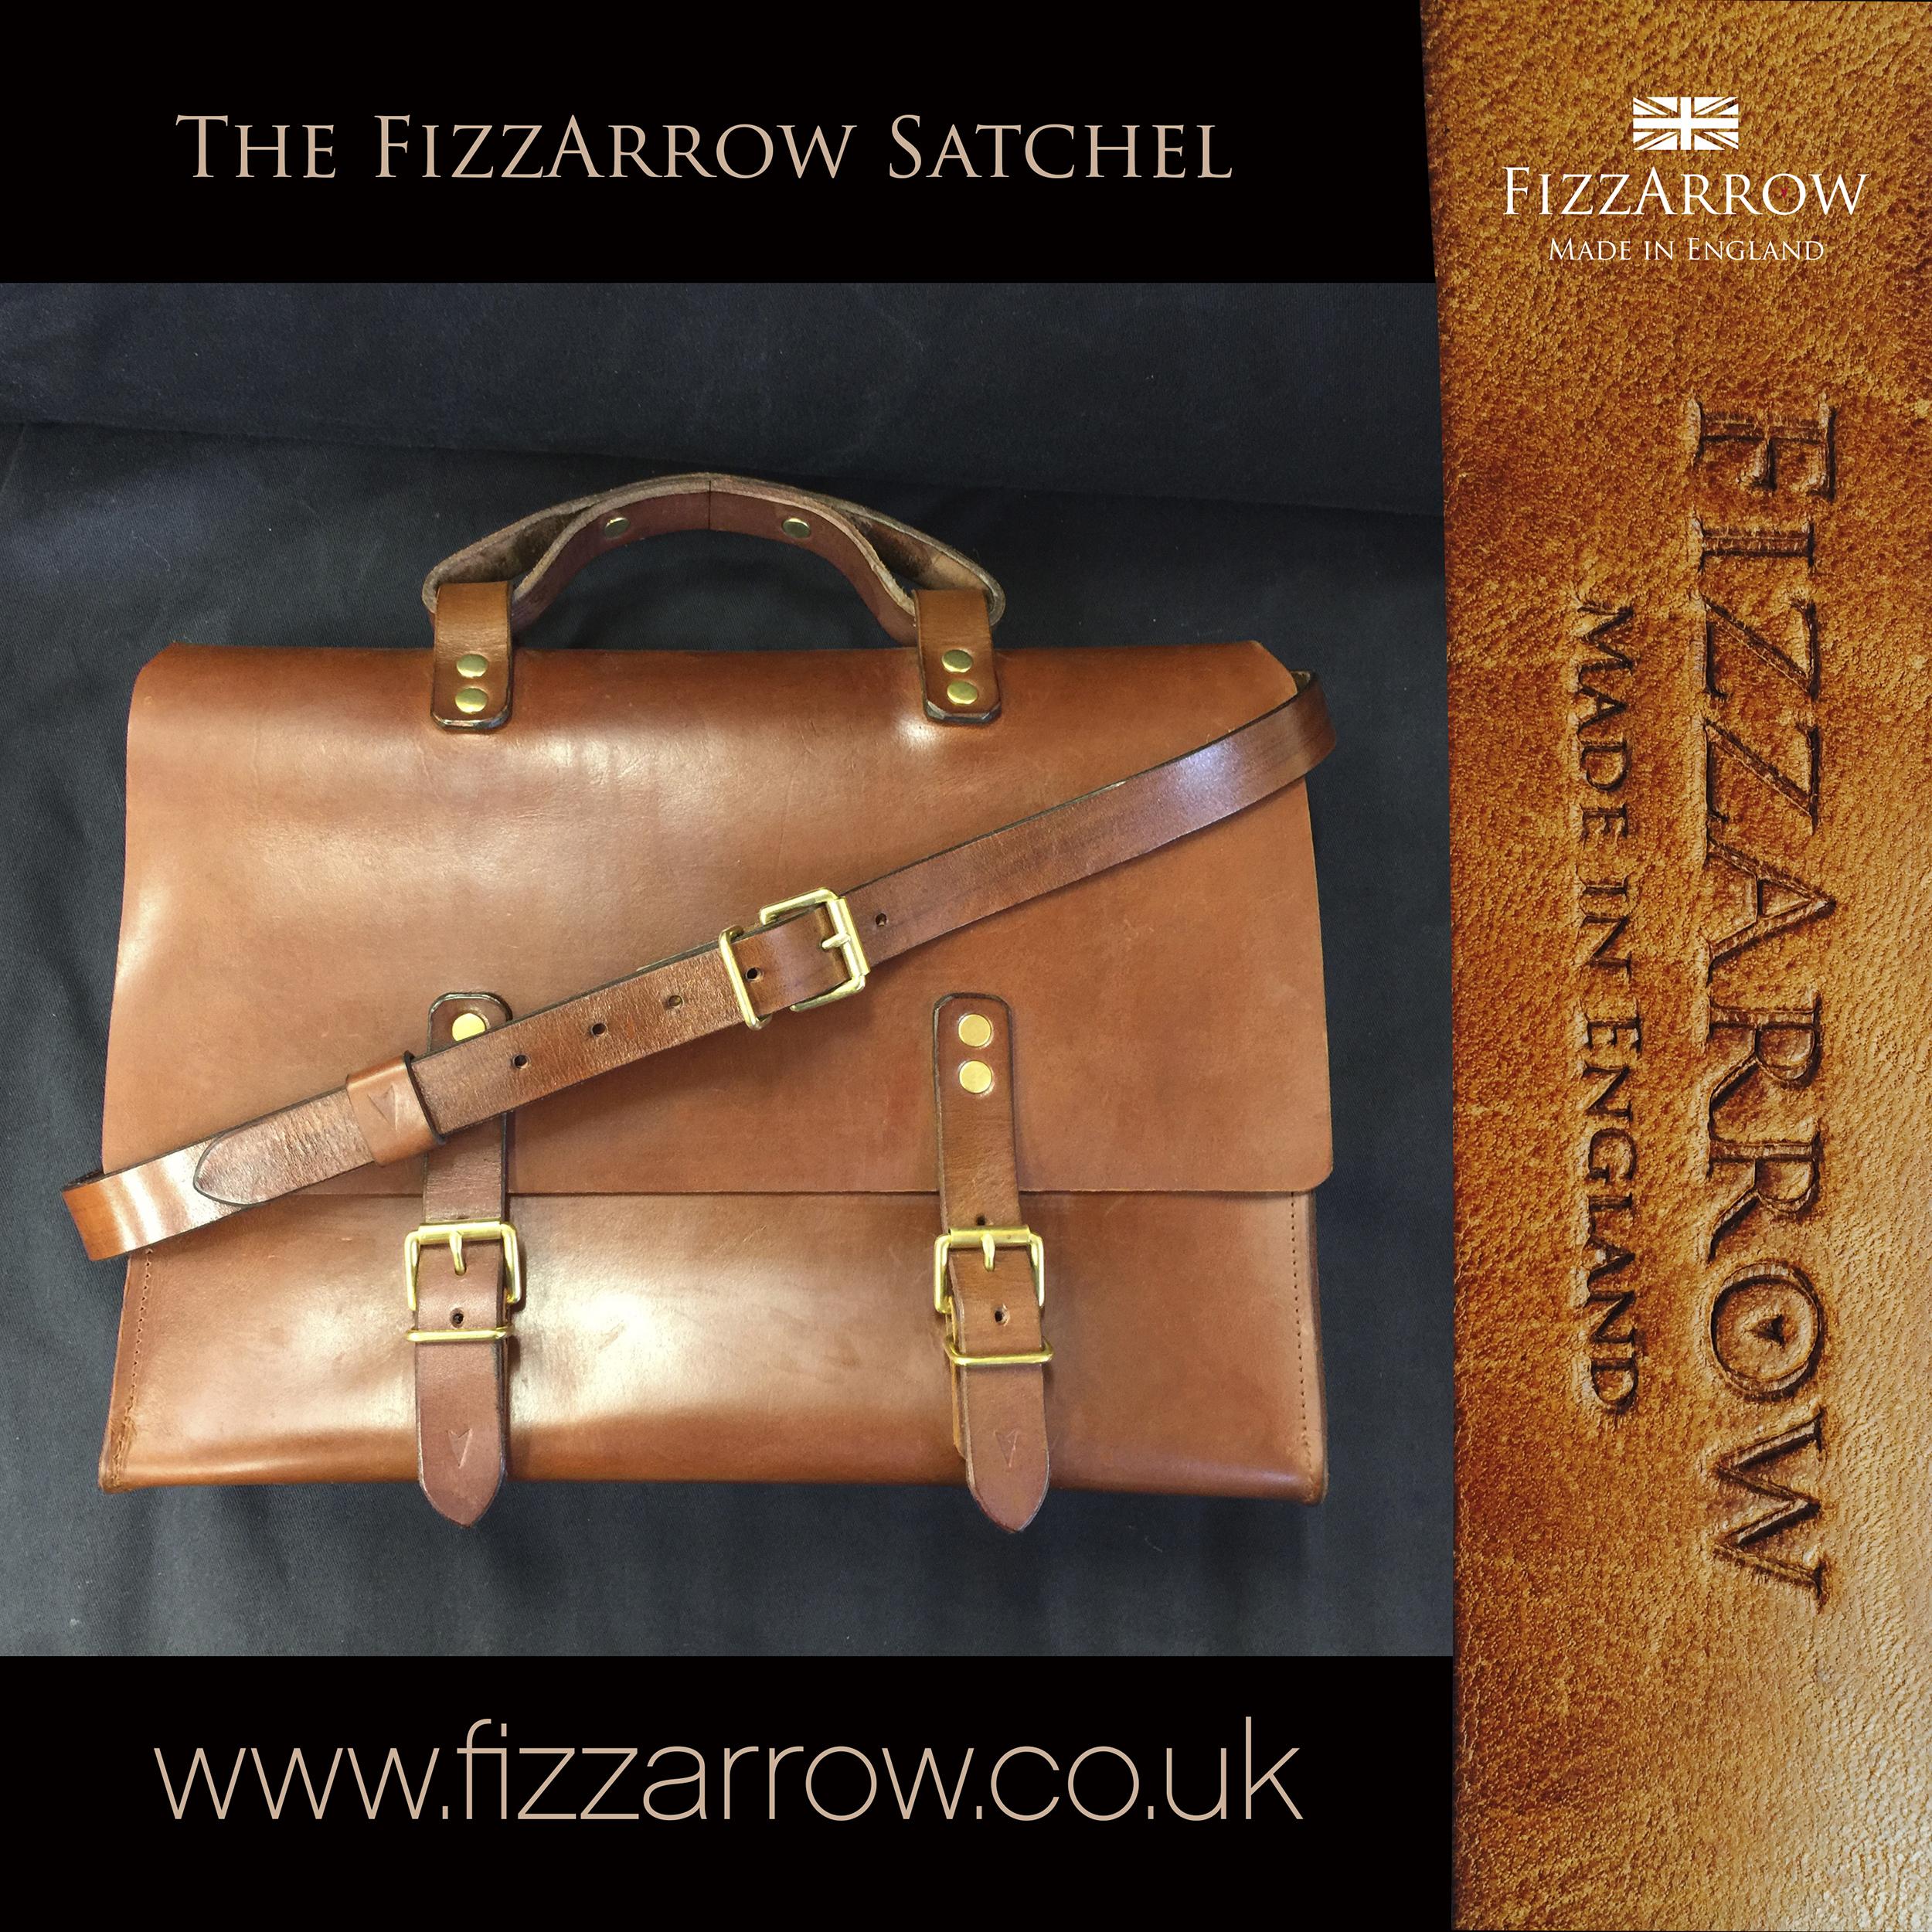 © The FizzArrow Satchel  ©FizzArrow images